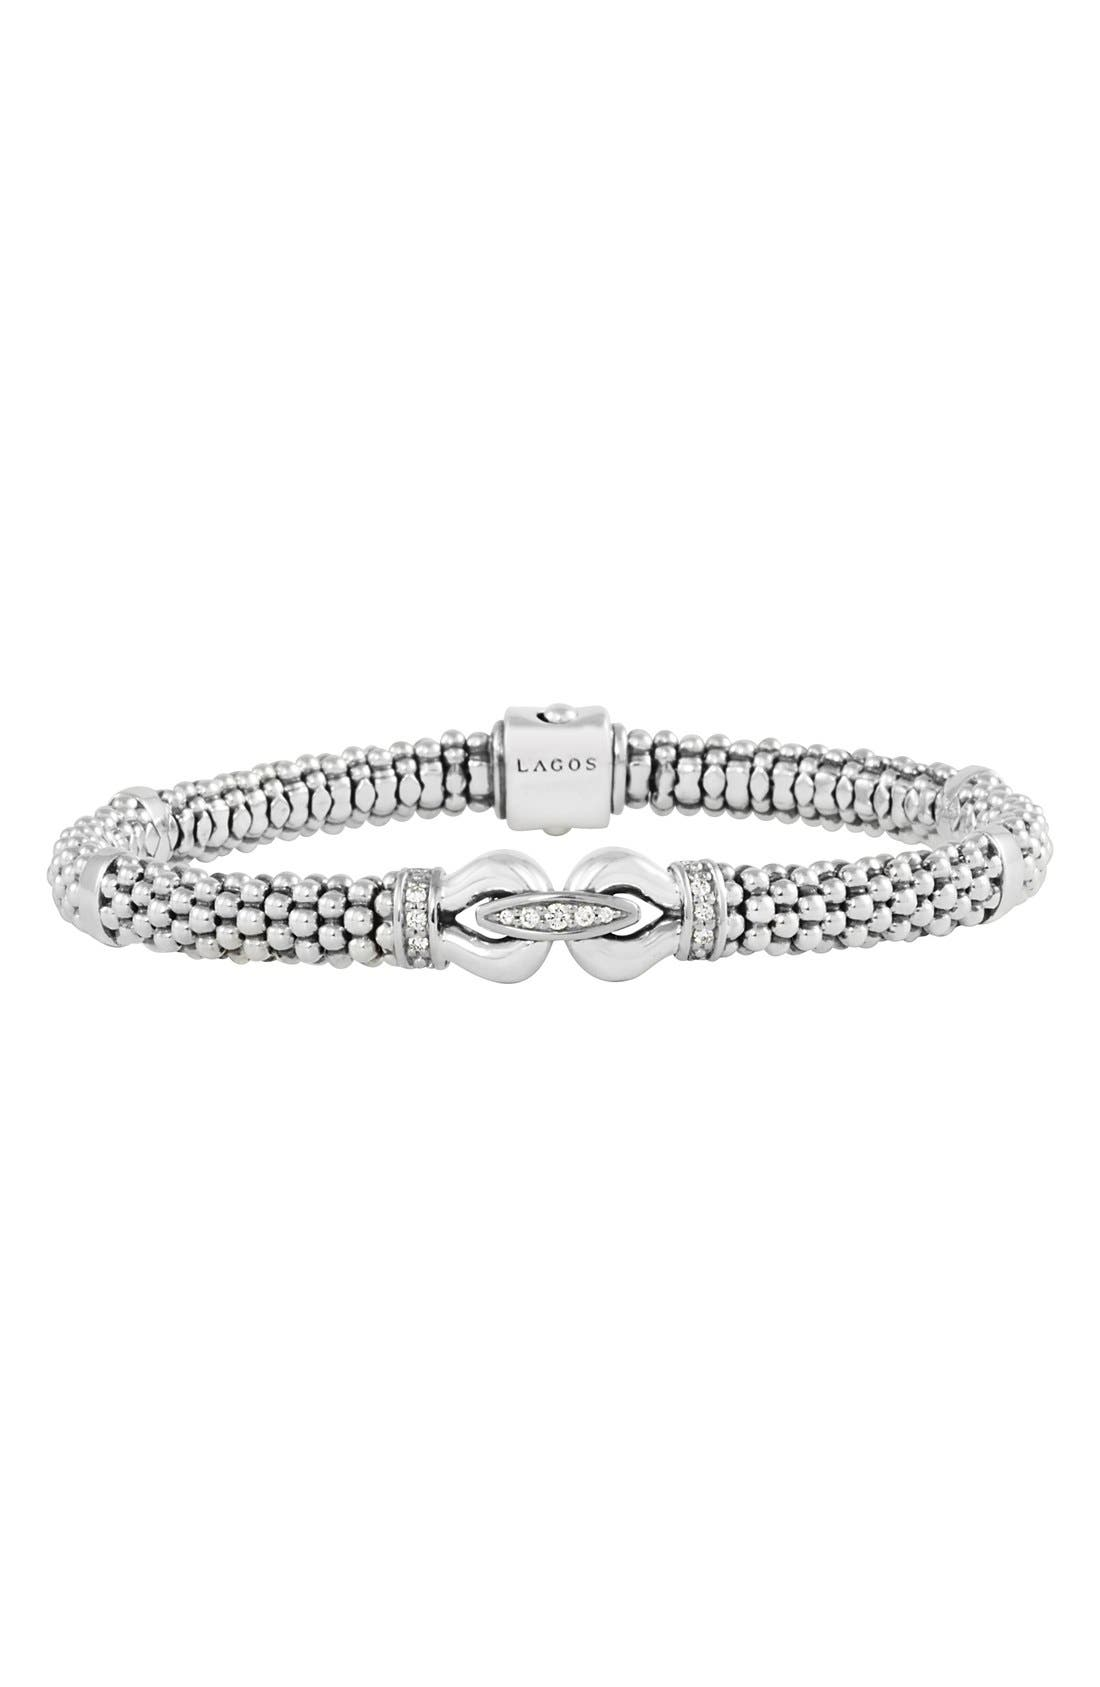 LAGOS Derby Diamond Buckle Rope Bracelet